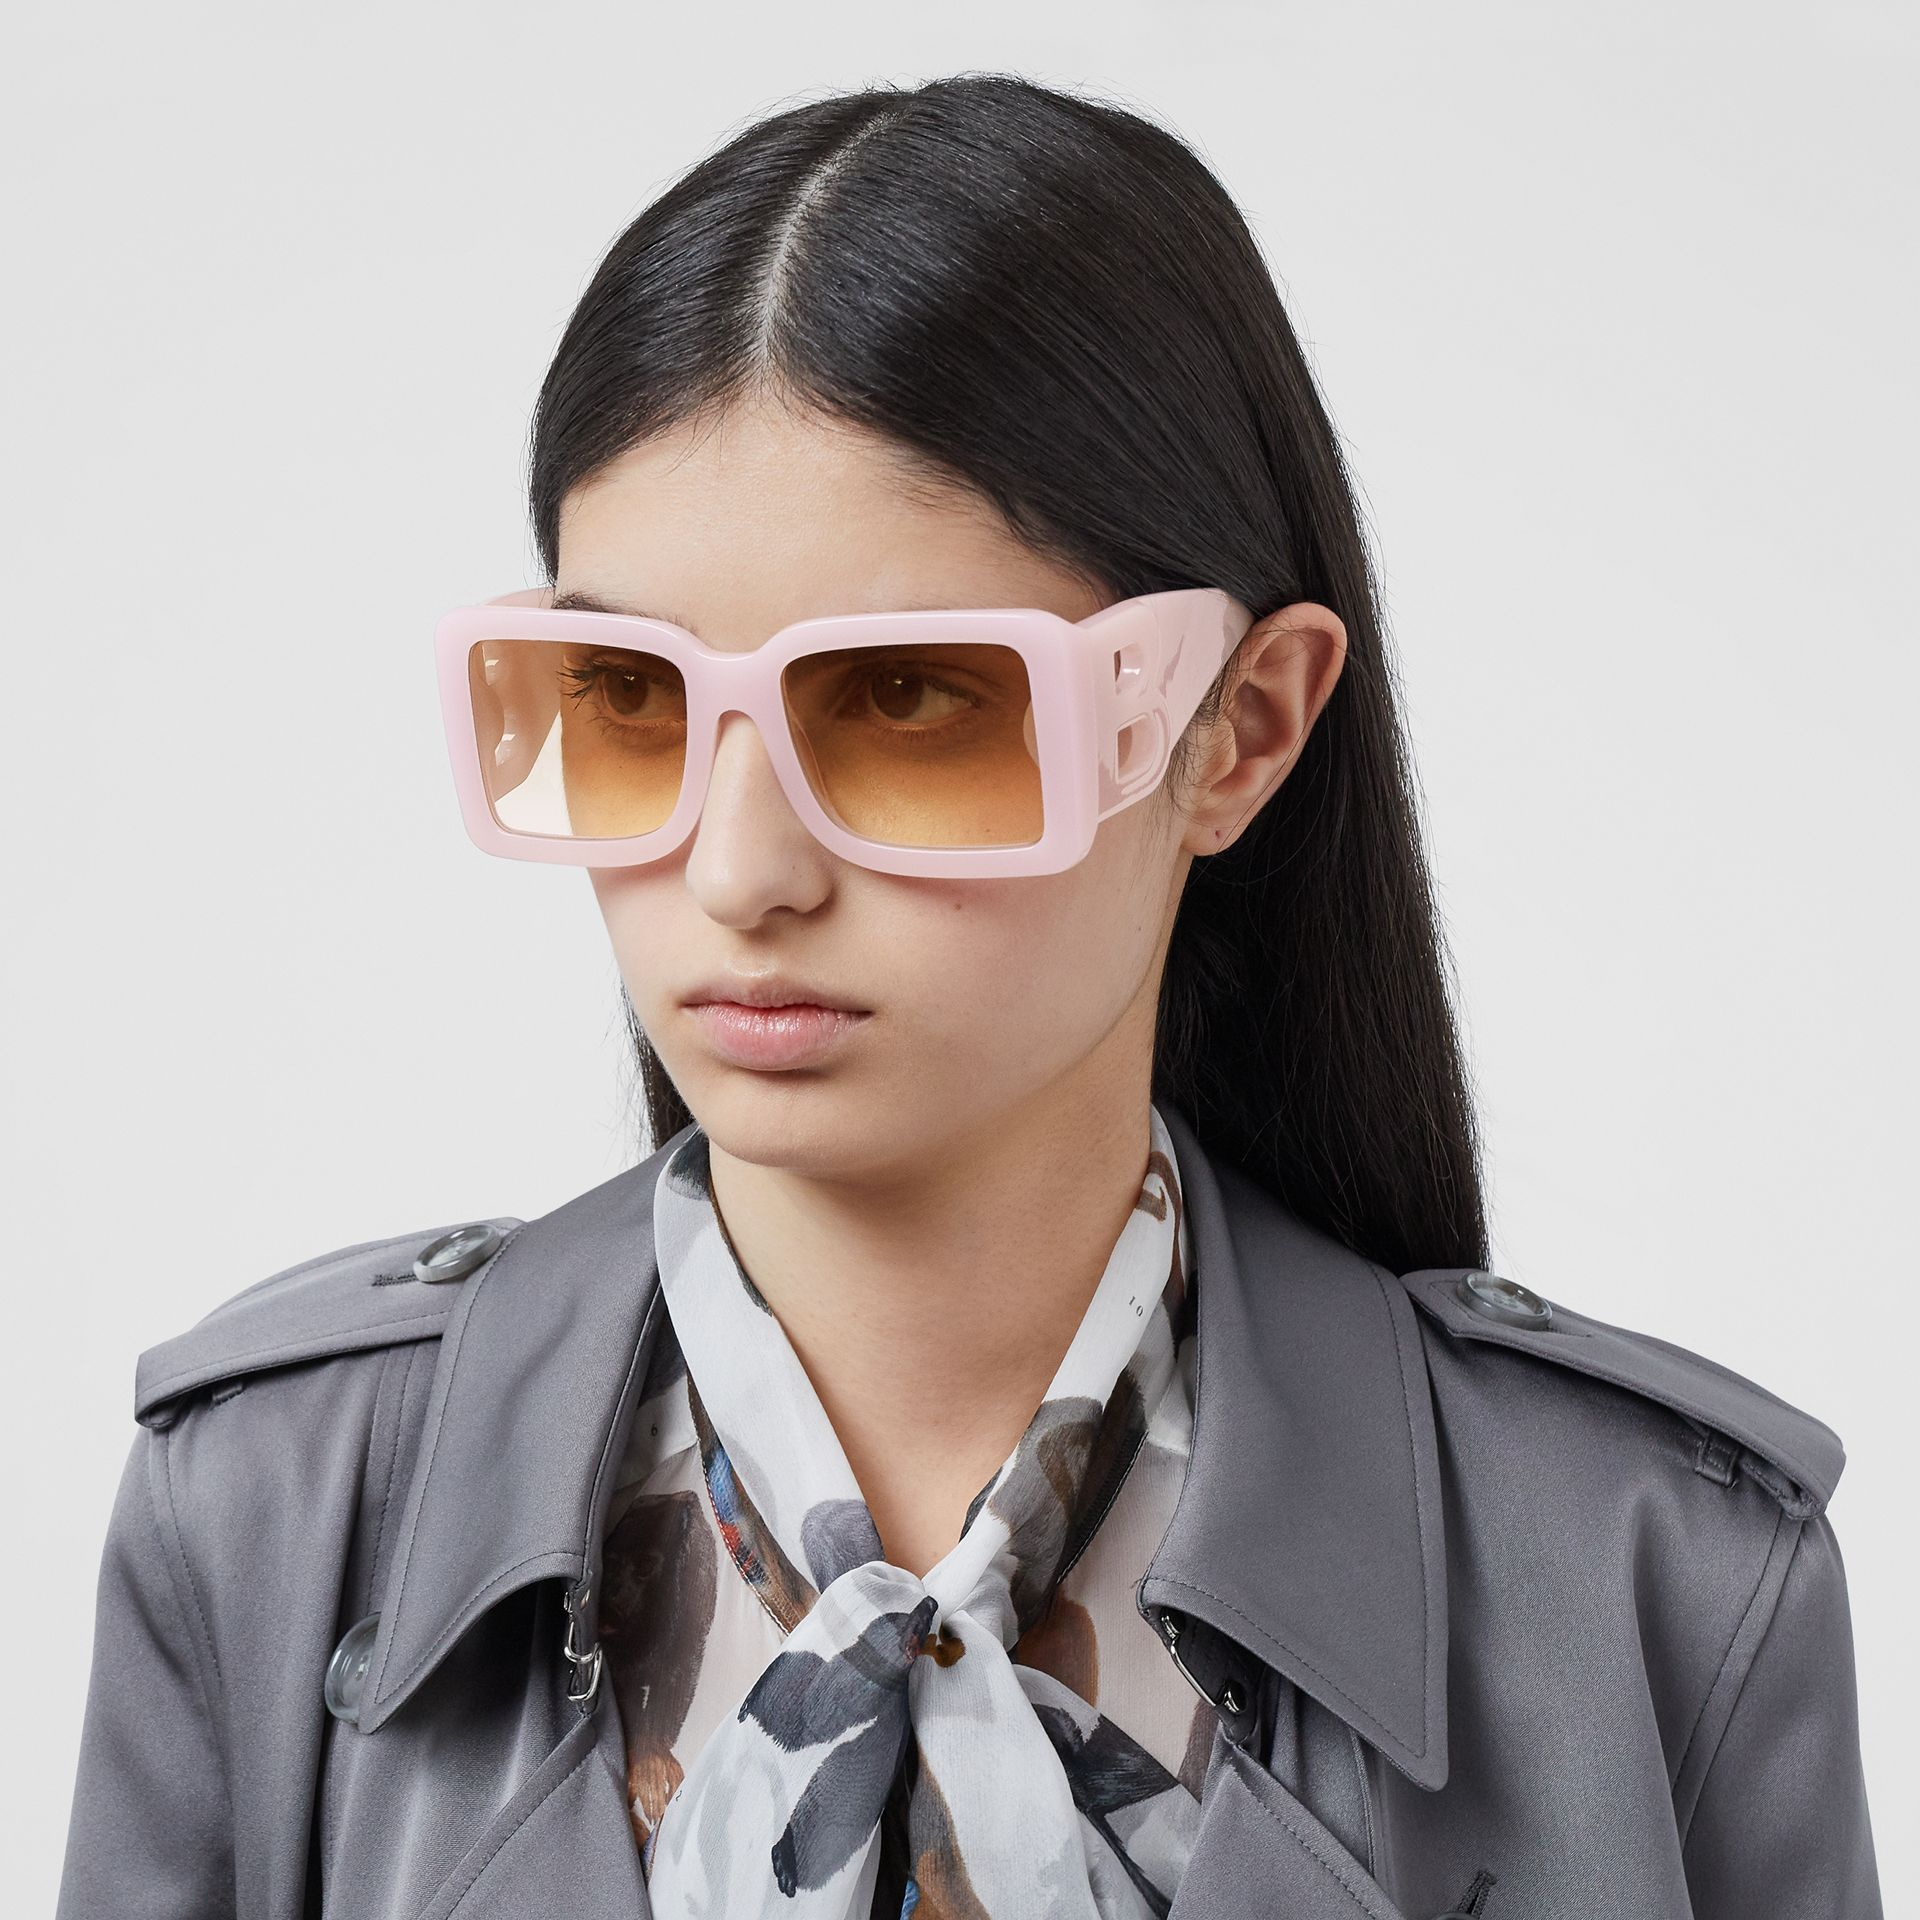 B Motif Square Frame Sunglasses in Lilac - Women | Burberry Australia - gallery image 2